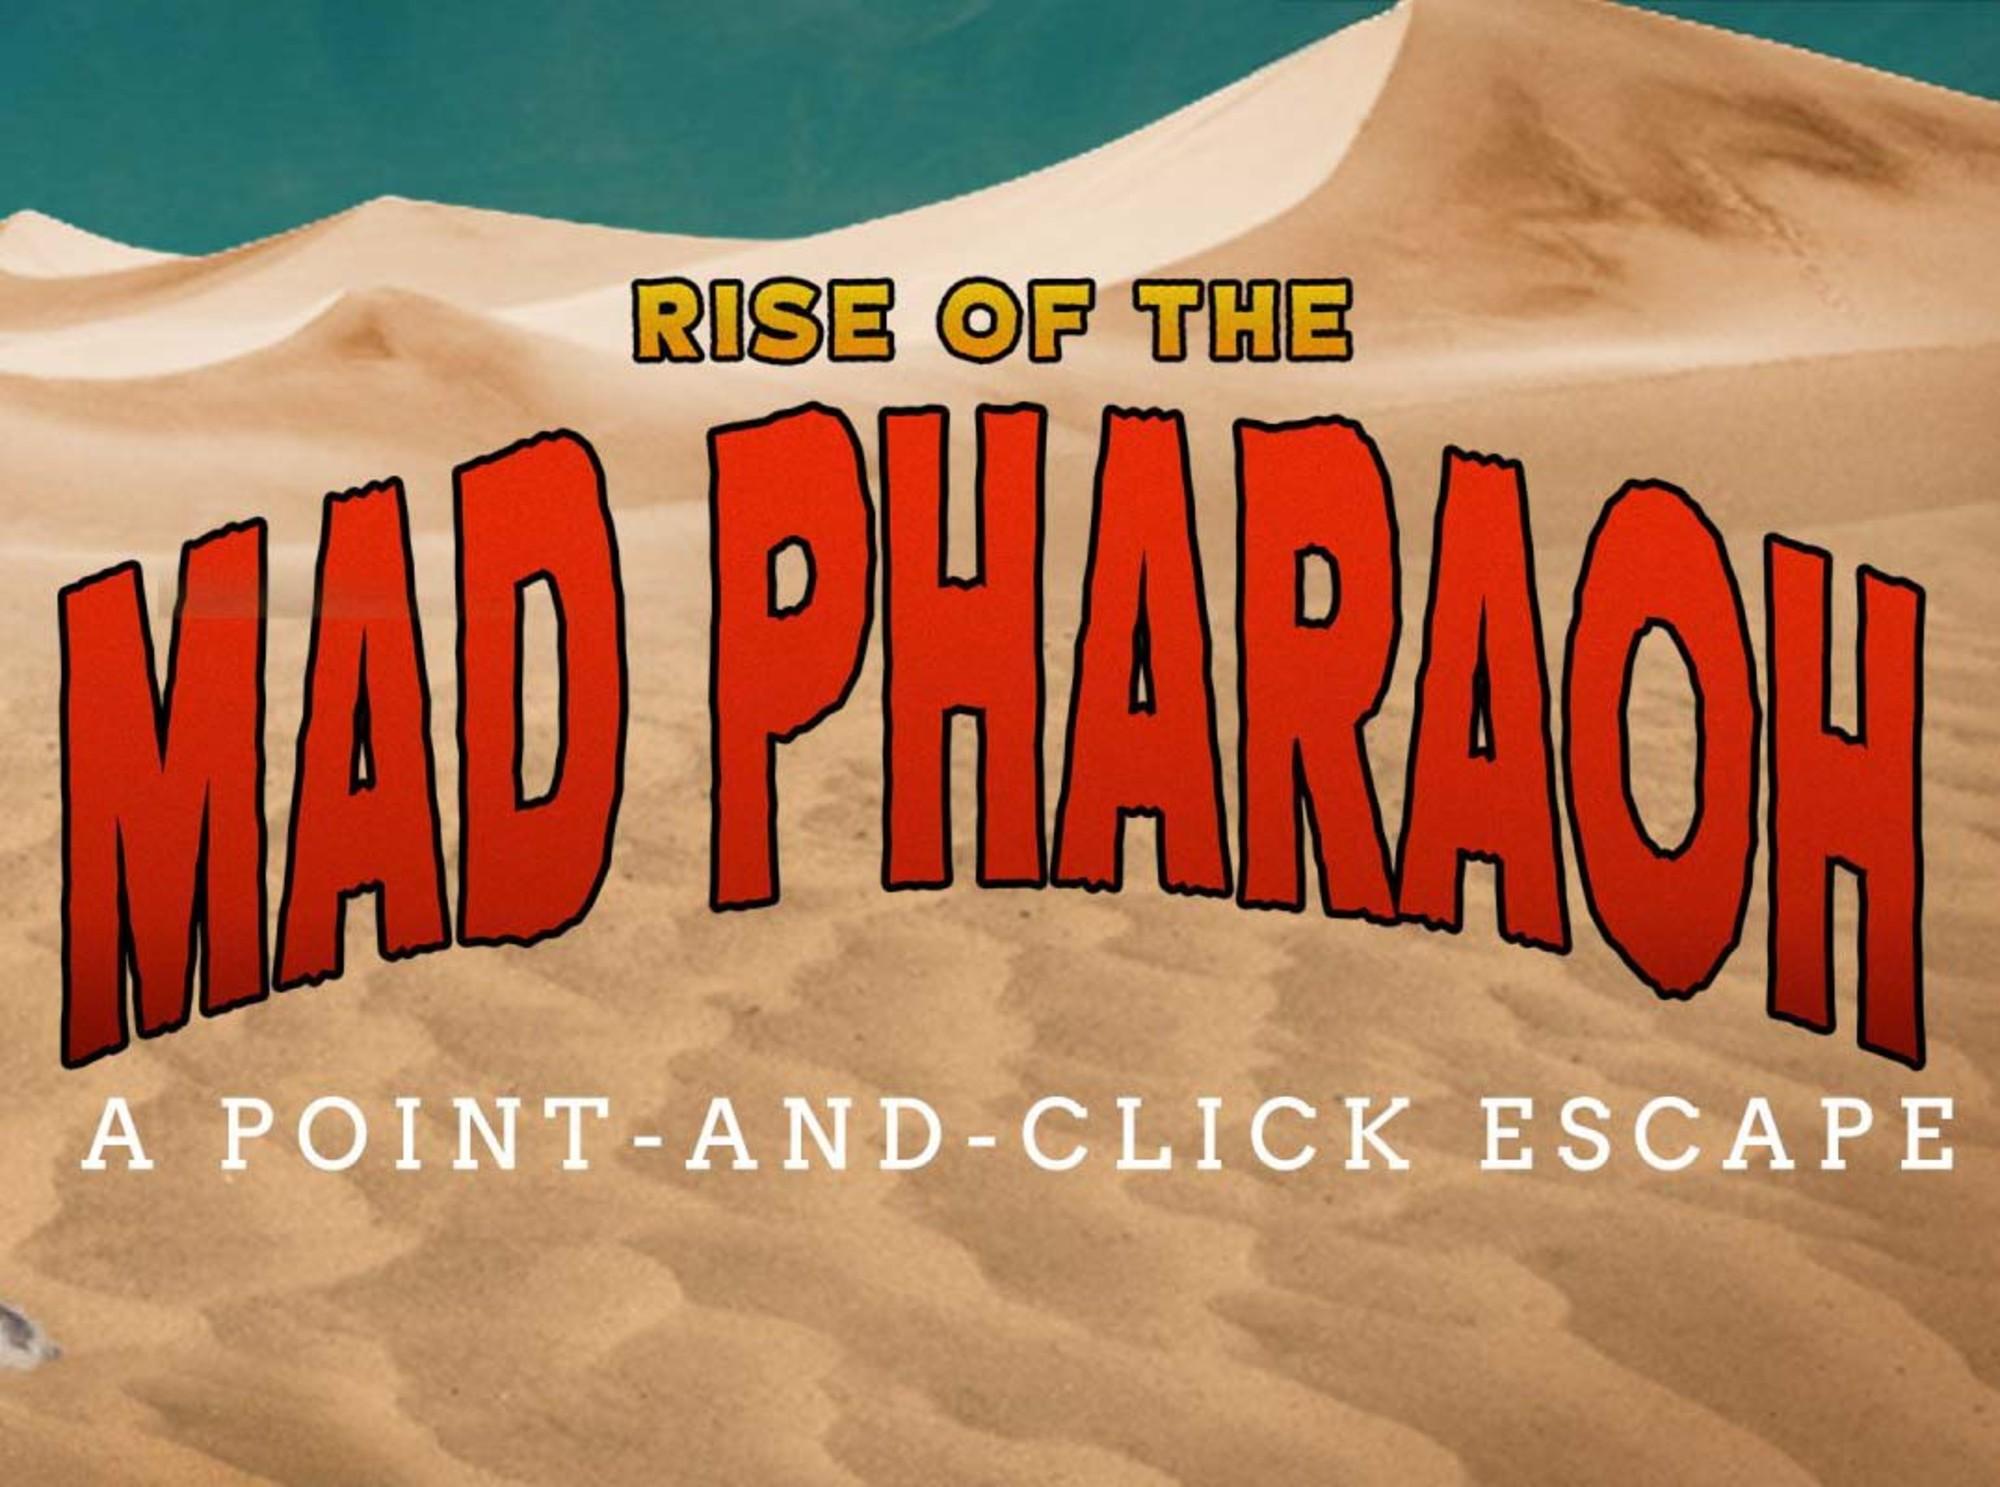 Ride of the Mad Pharaoh